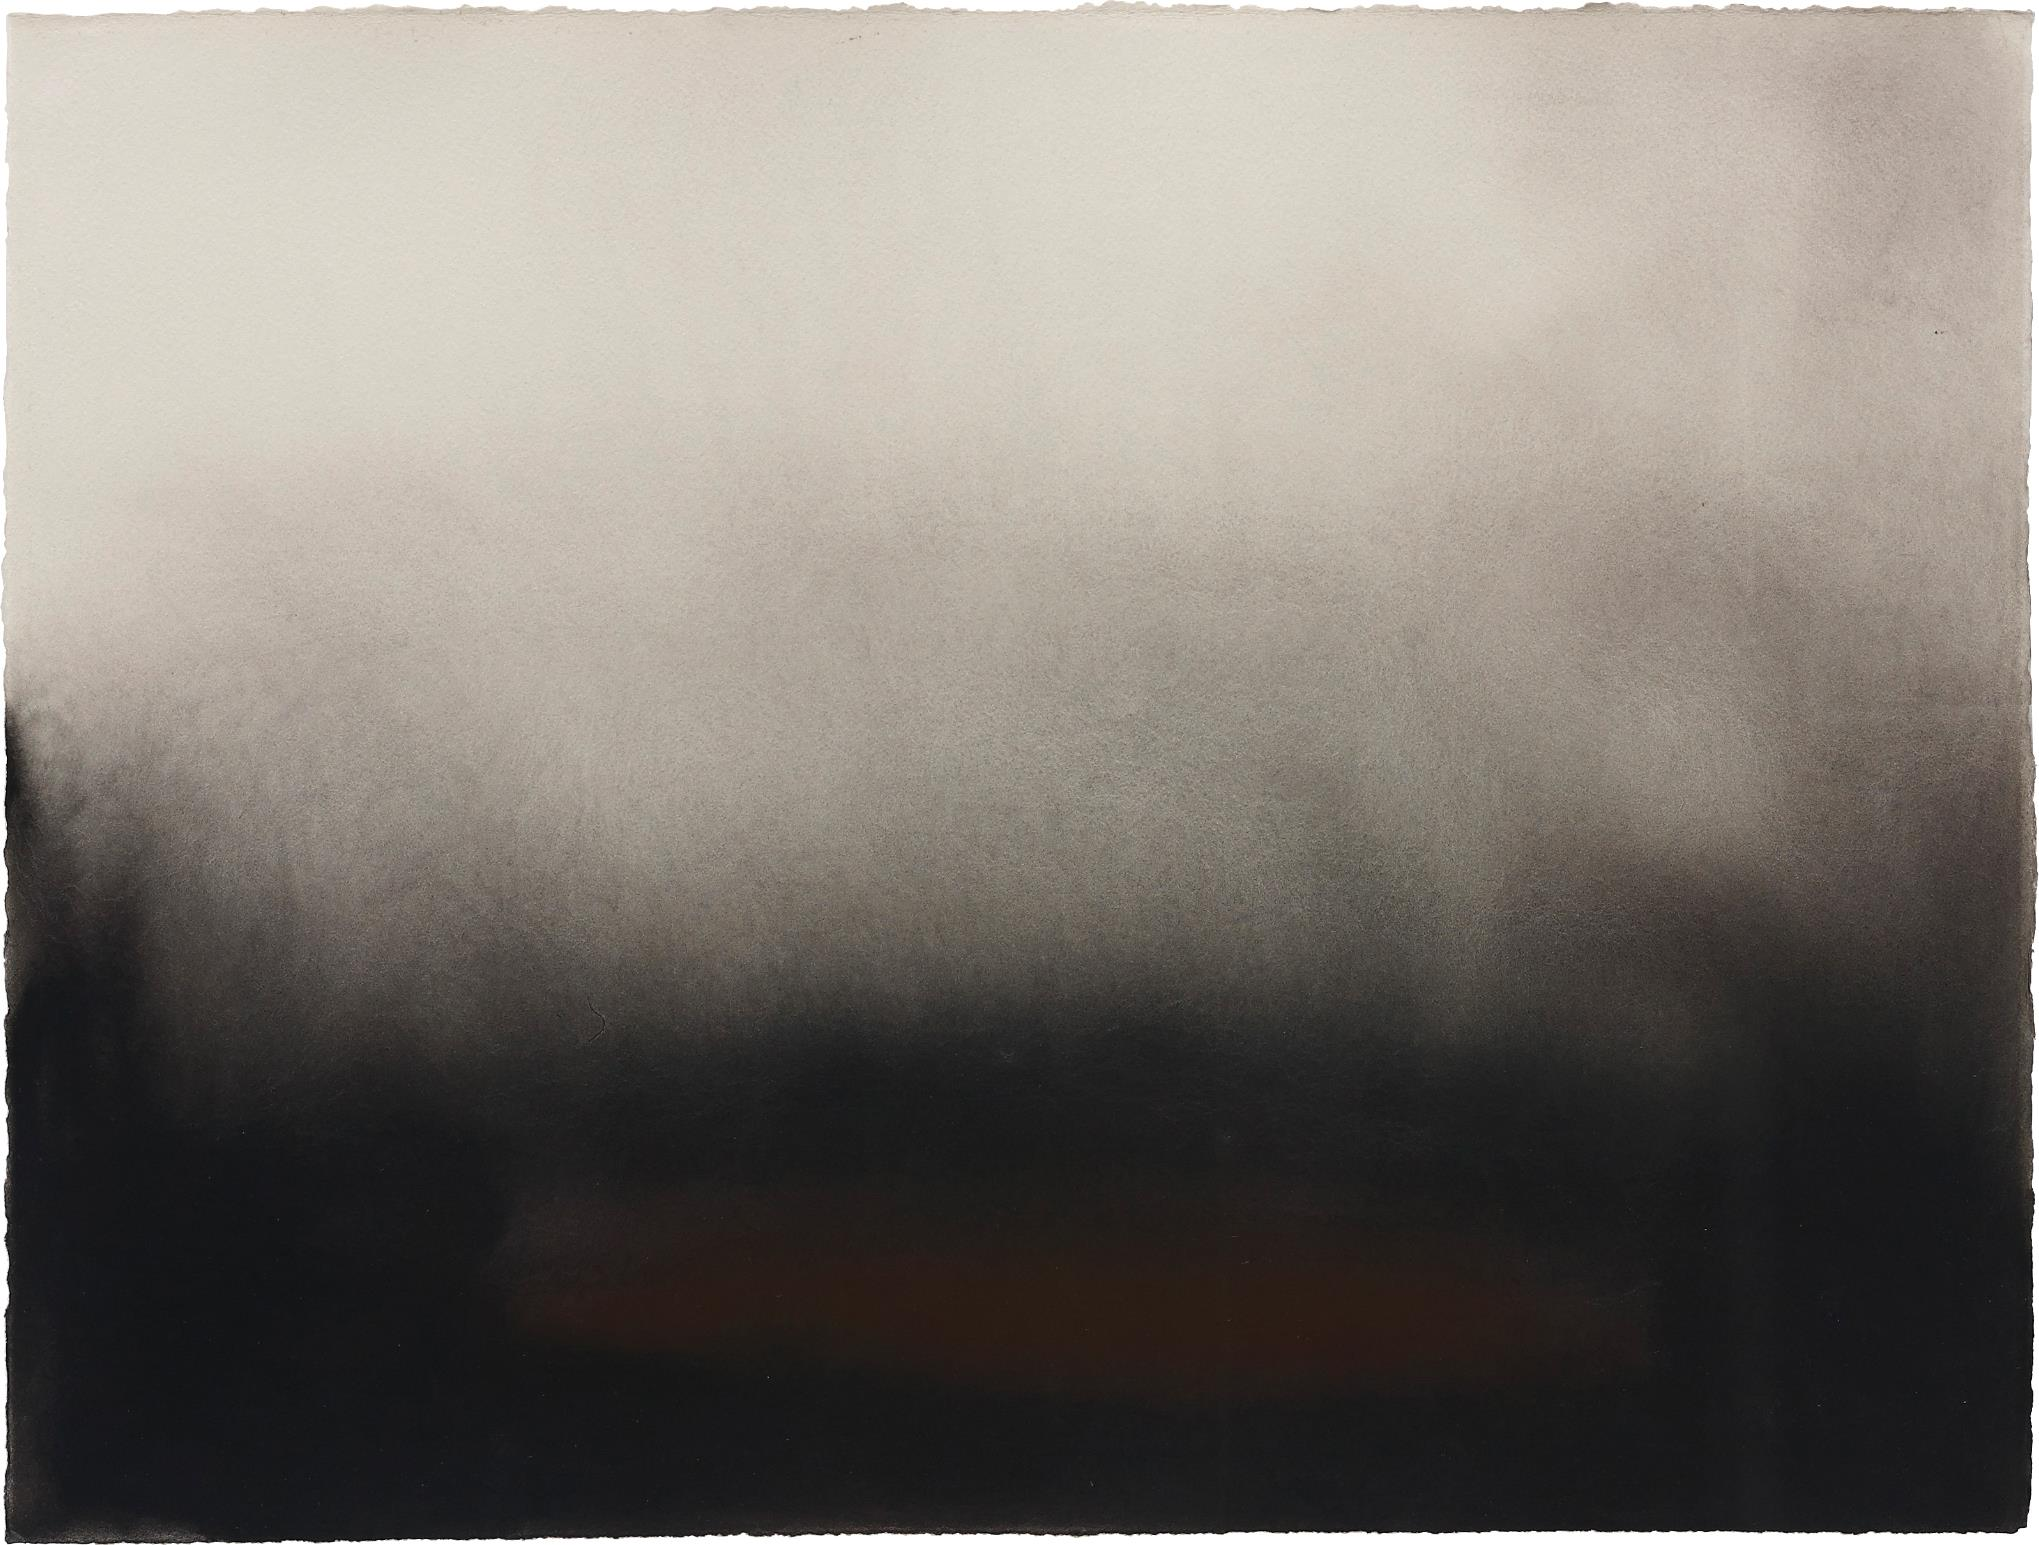 Anish Kapoor-Untitled-2001